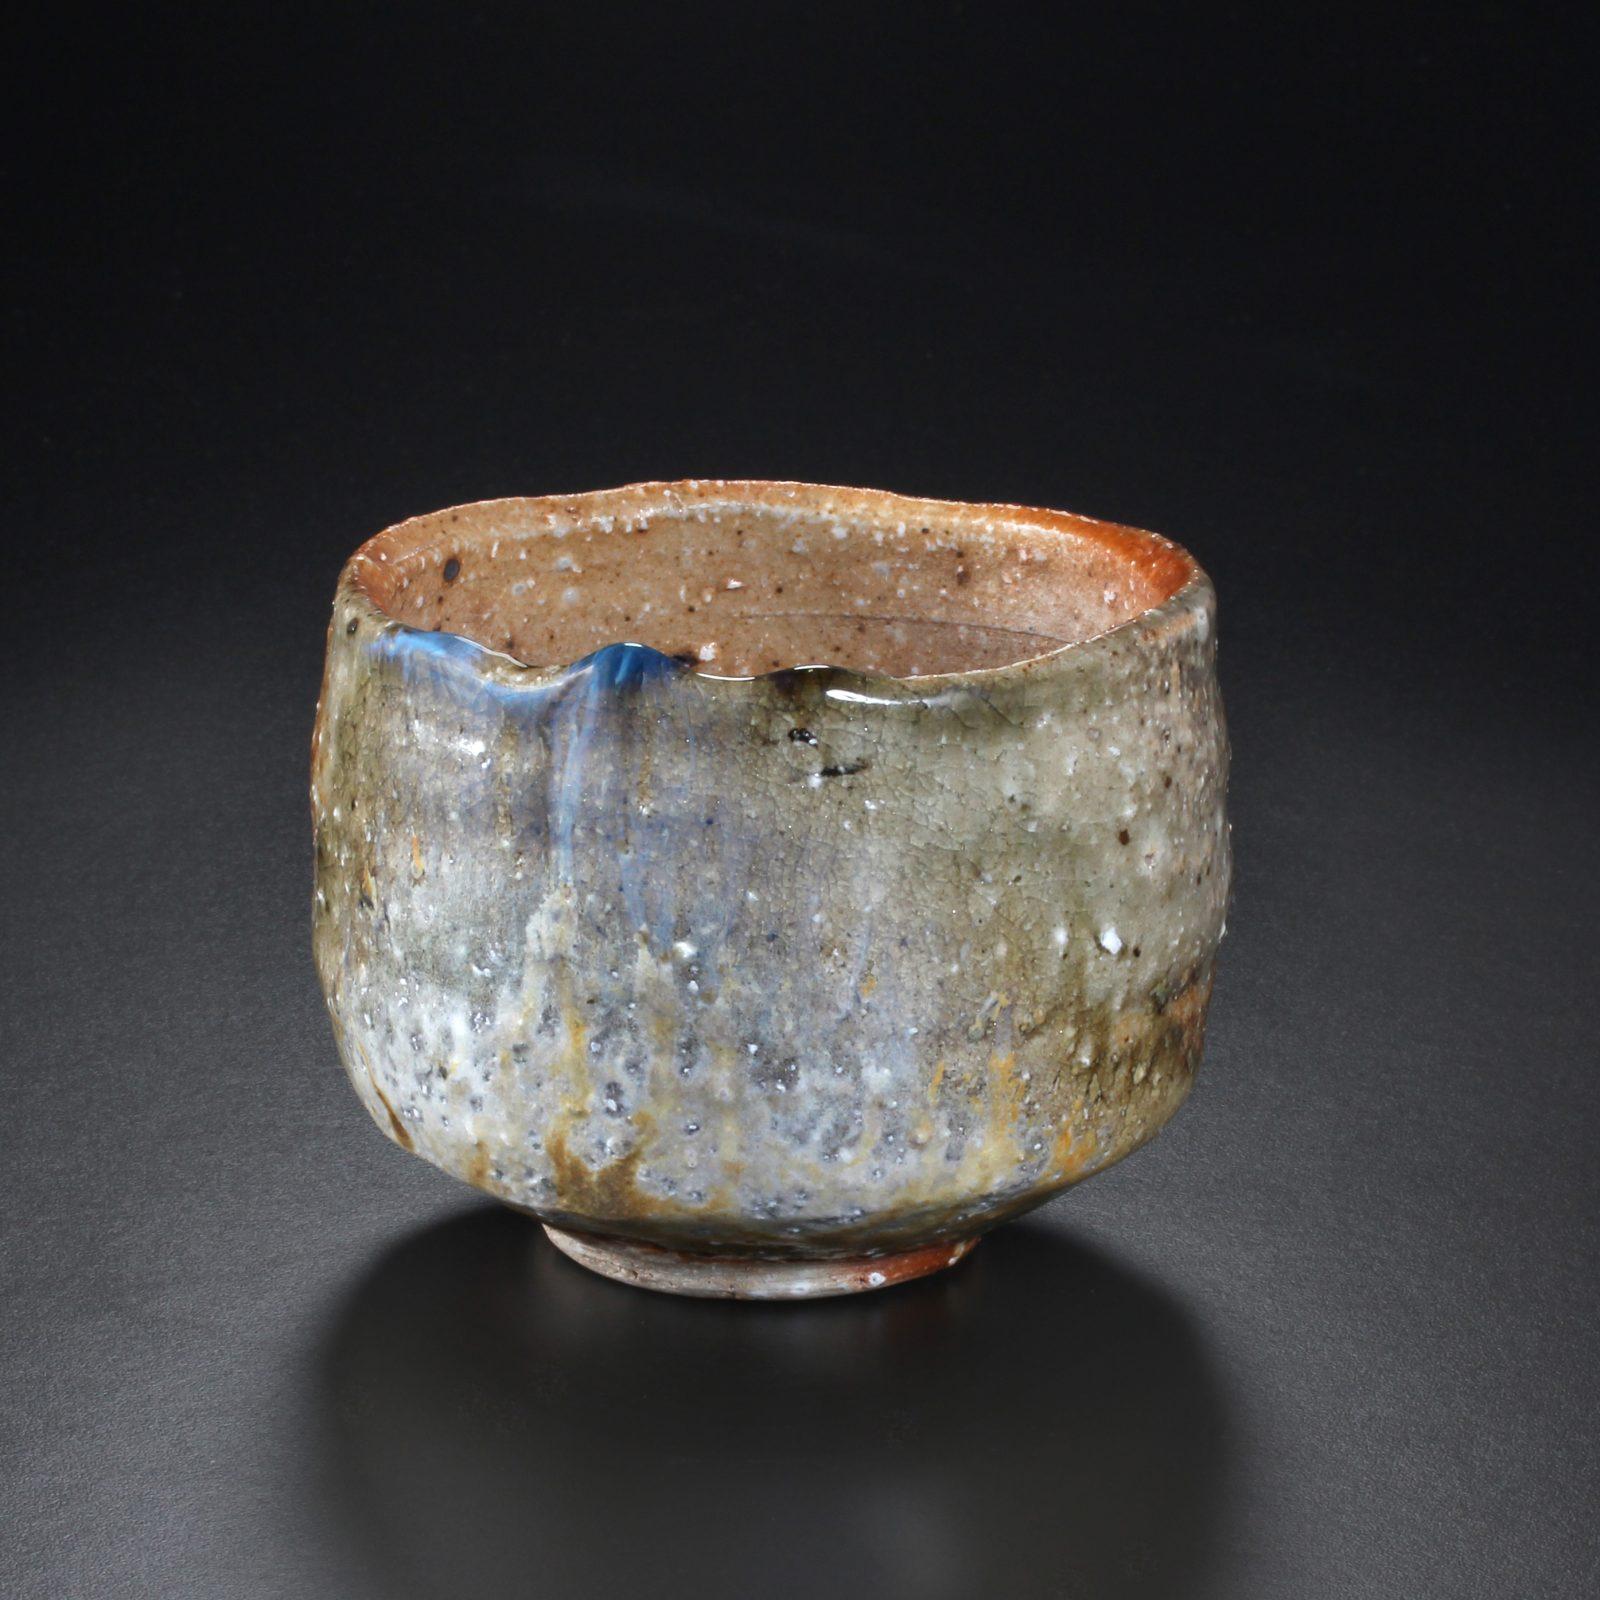 Uwe Löllmann –Chawan –h3cm, Holzbrand – Galerie Metzger Aschaffenburg Kunst Keramik angewandte Kunst Art Gallery Woodfiring